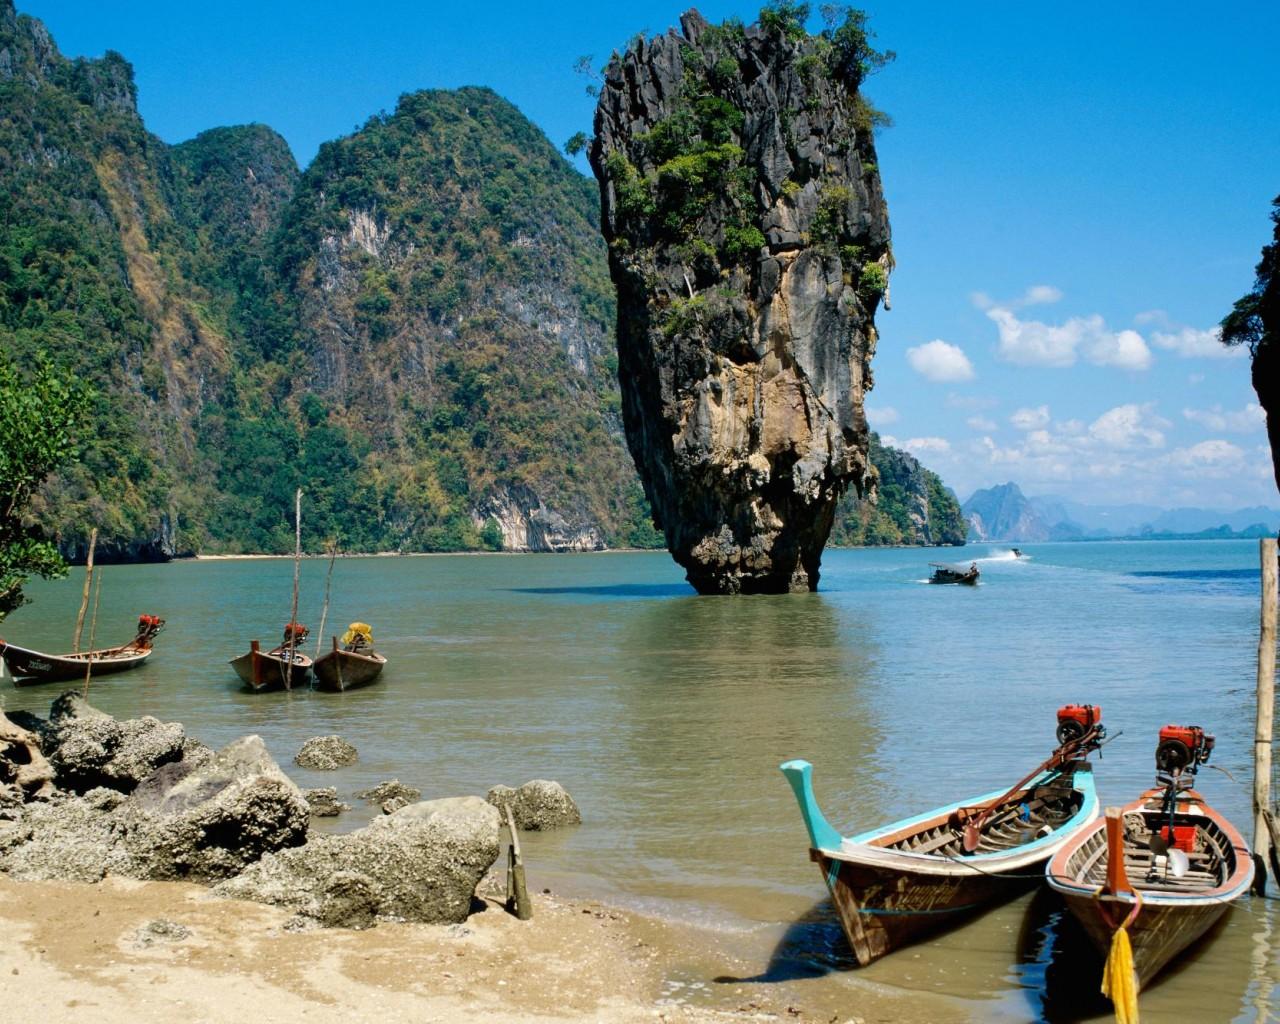 Острова Пхи Пхи | Тайланд | Турагентство «Мультипасс» | 8 (499) 653-6300